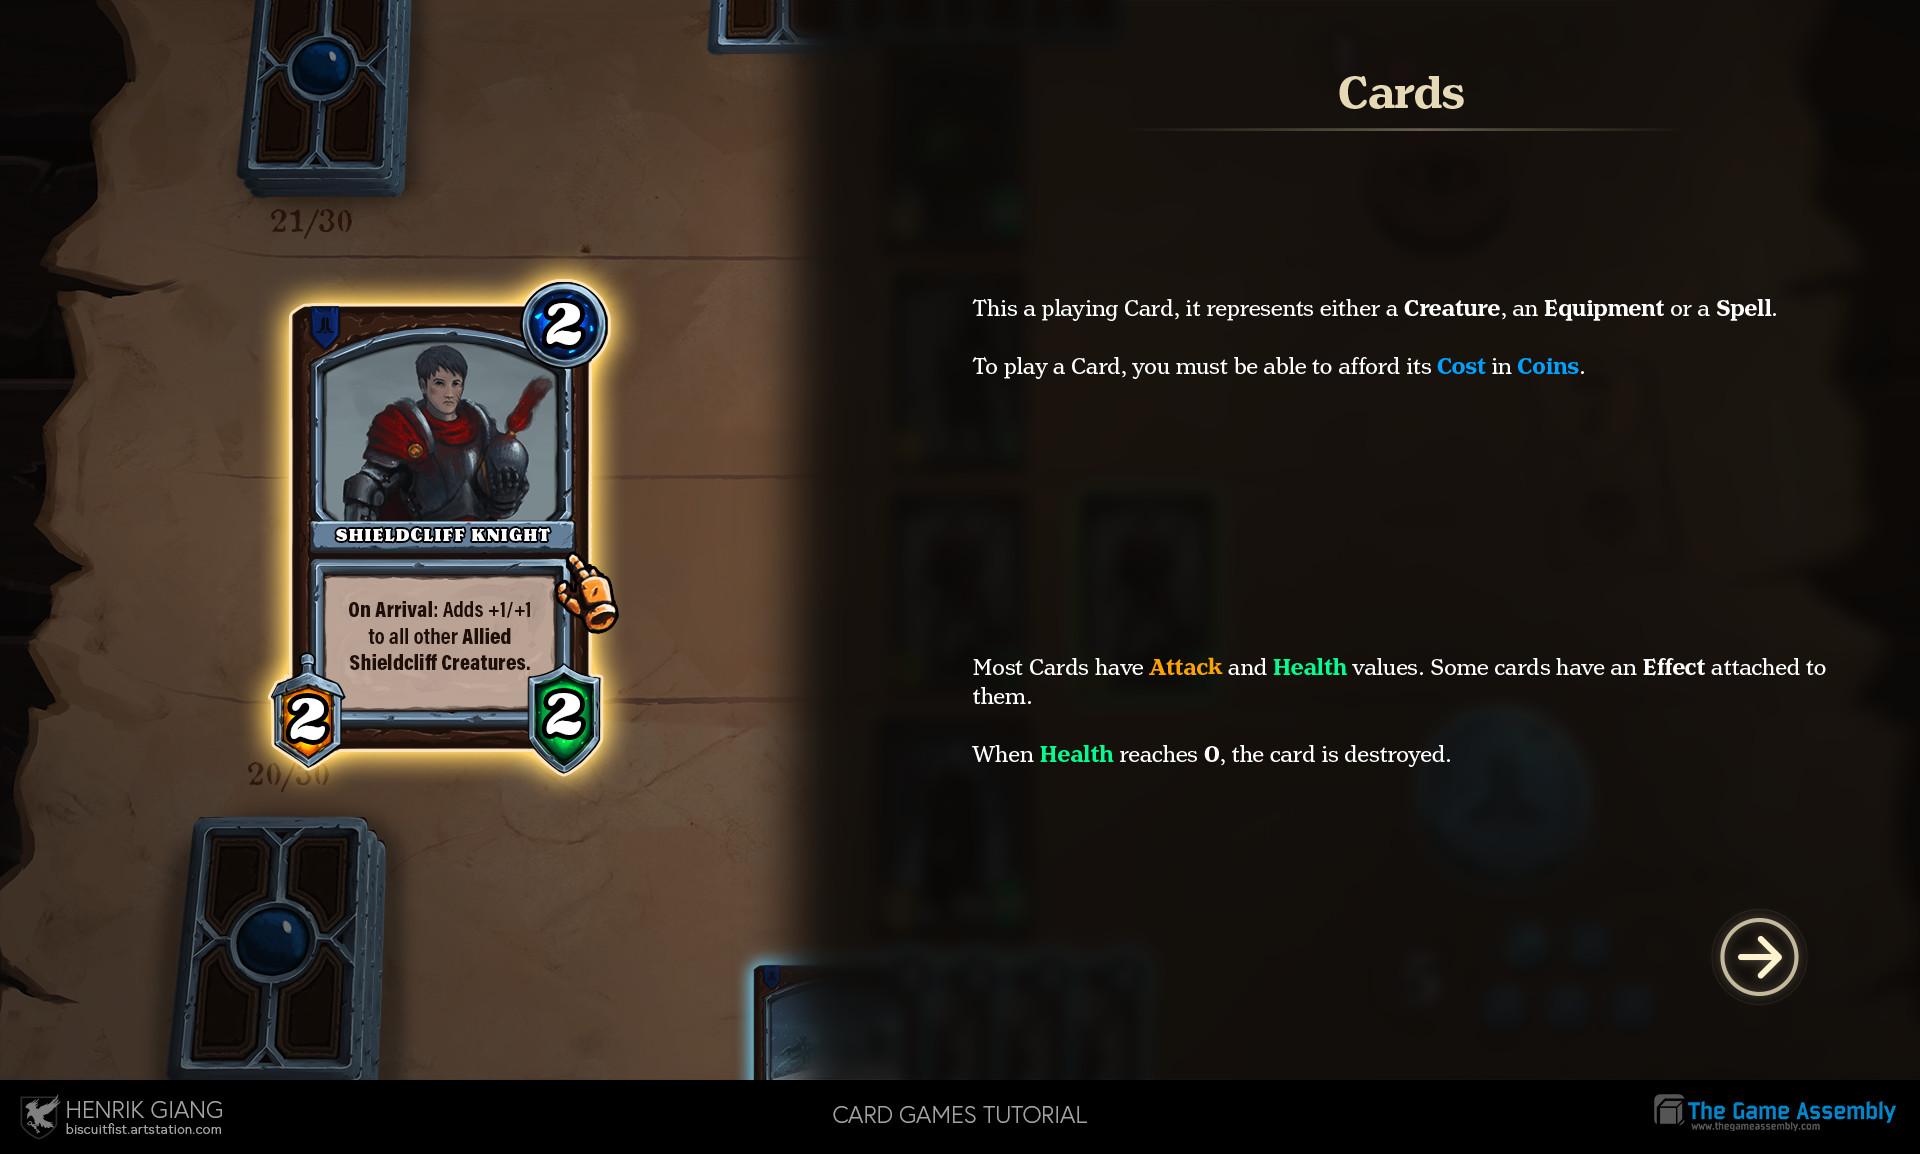 Henrik giang henrikgiang cardgame2